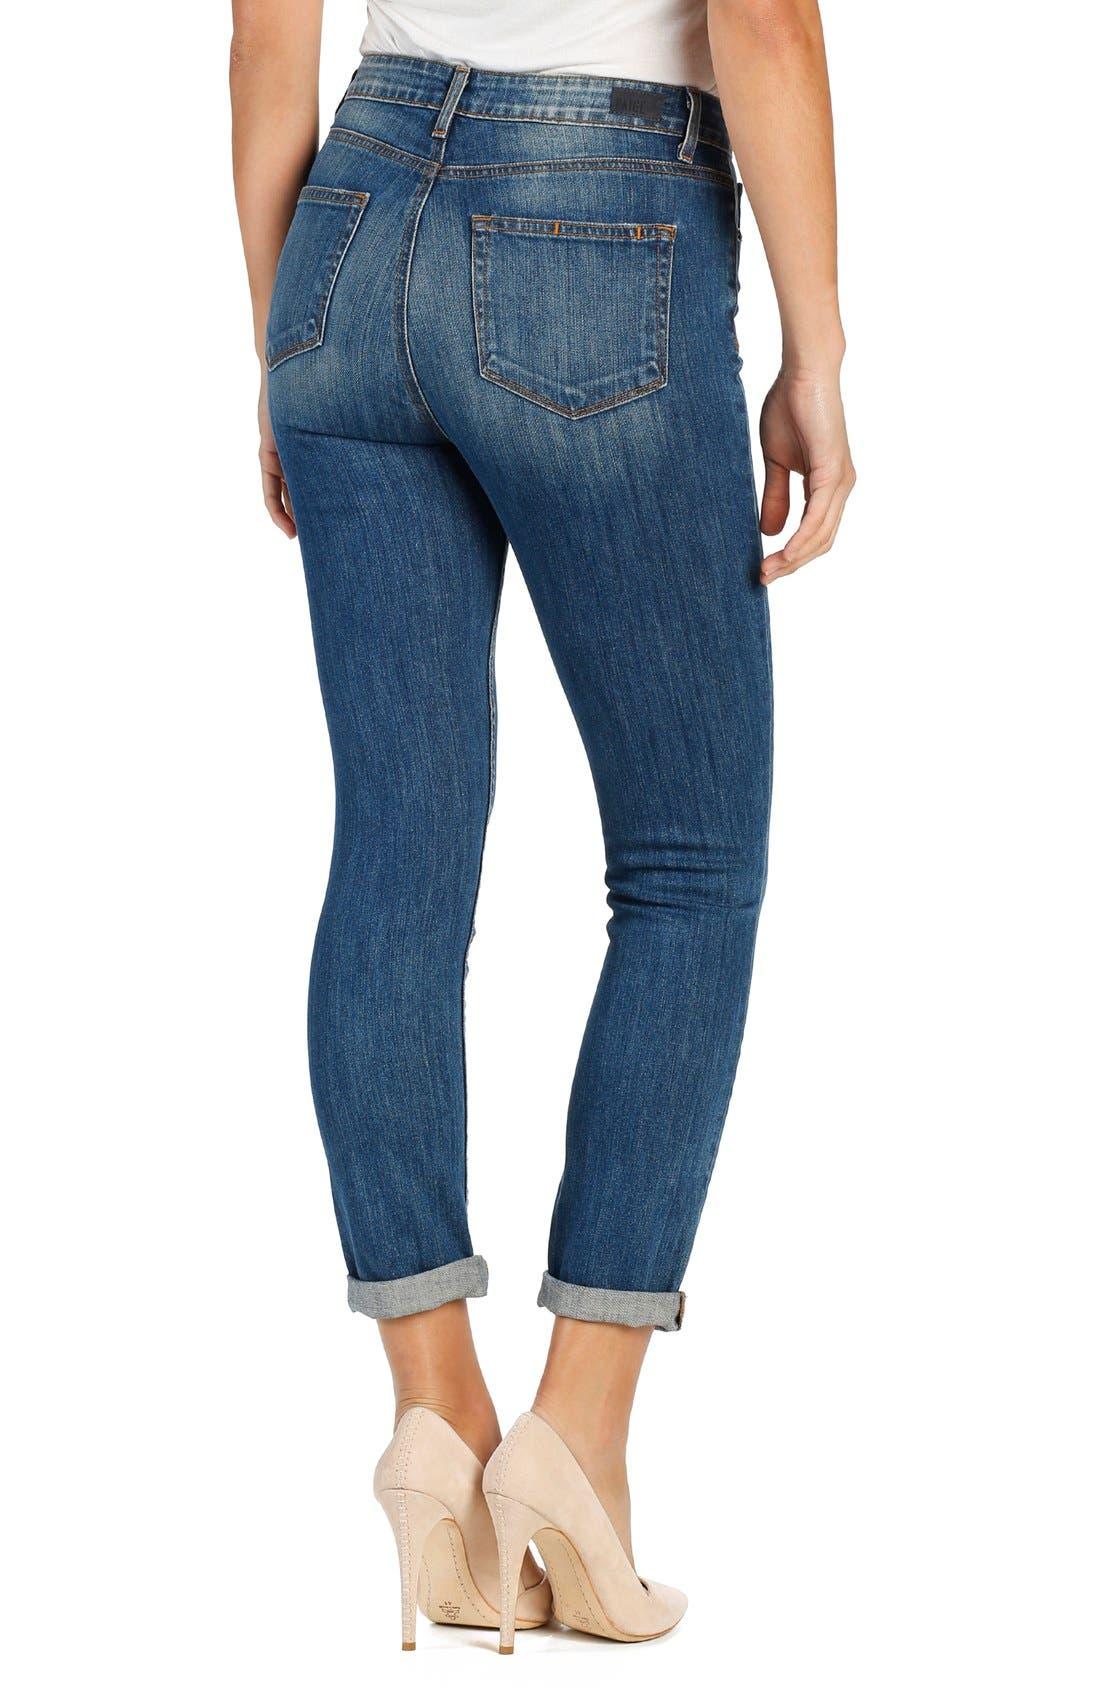 Alternate Image 2  - PAIGE 'Carter' High Rise Crop Slim Jeans (Tallulah)